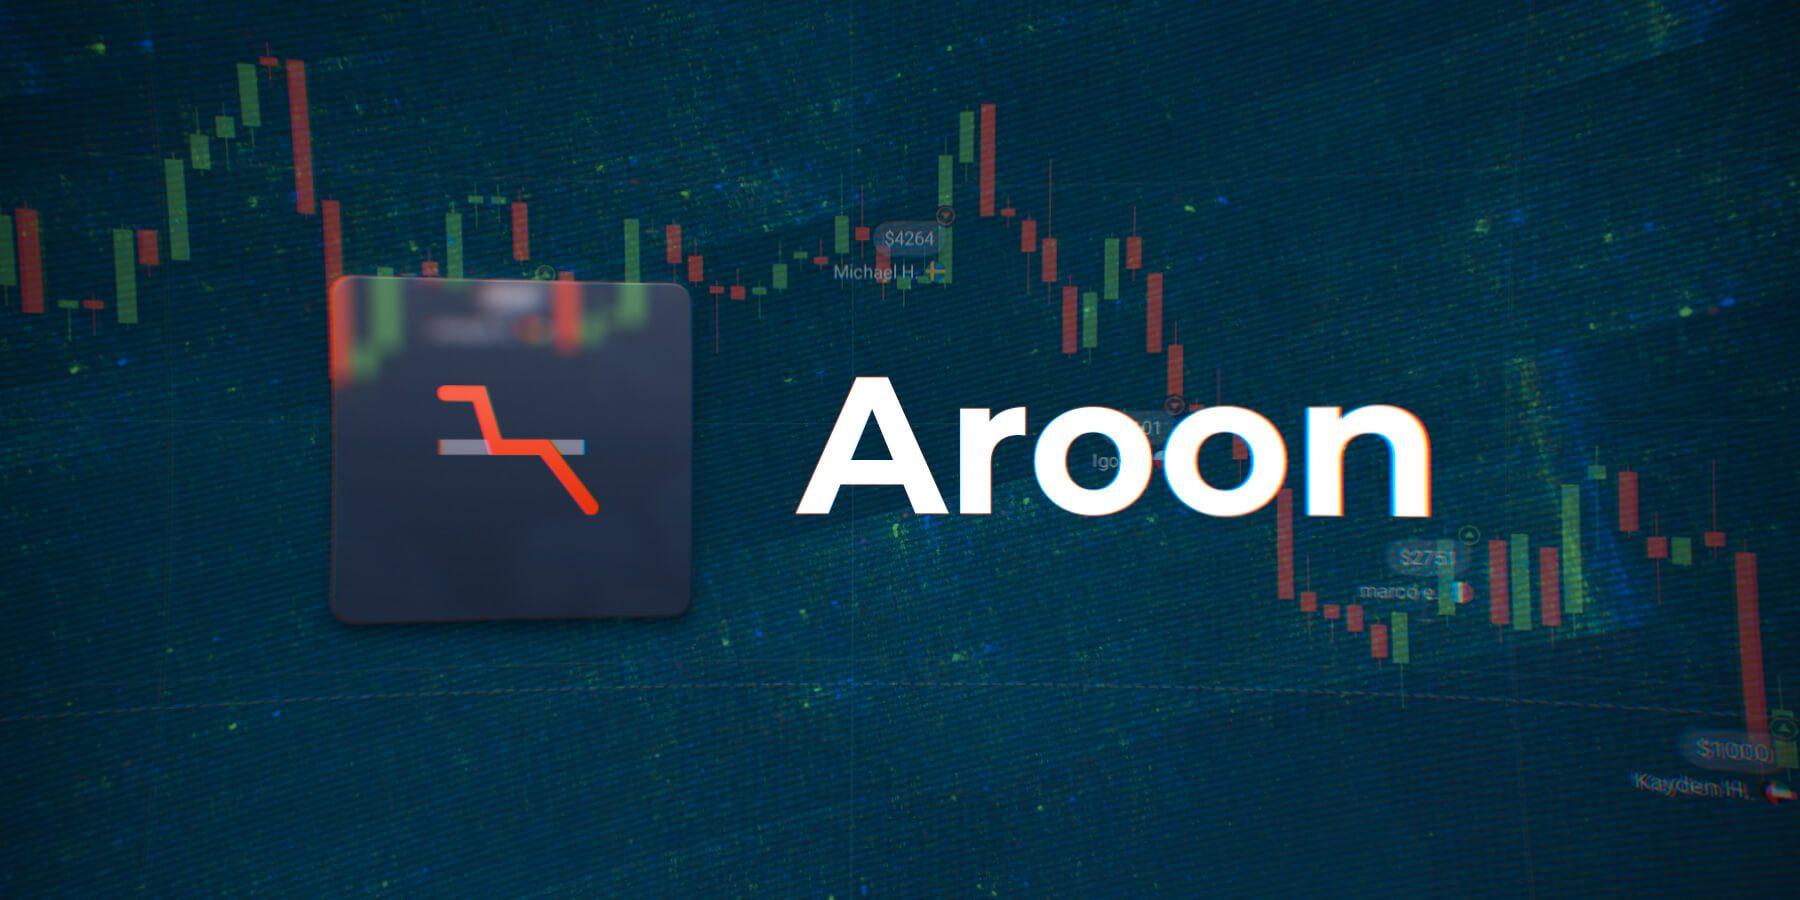 indicator de opțiuni binare aroon face bani pe internet pf ghjcvjnhf dbltj